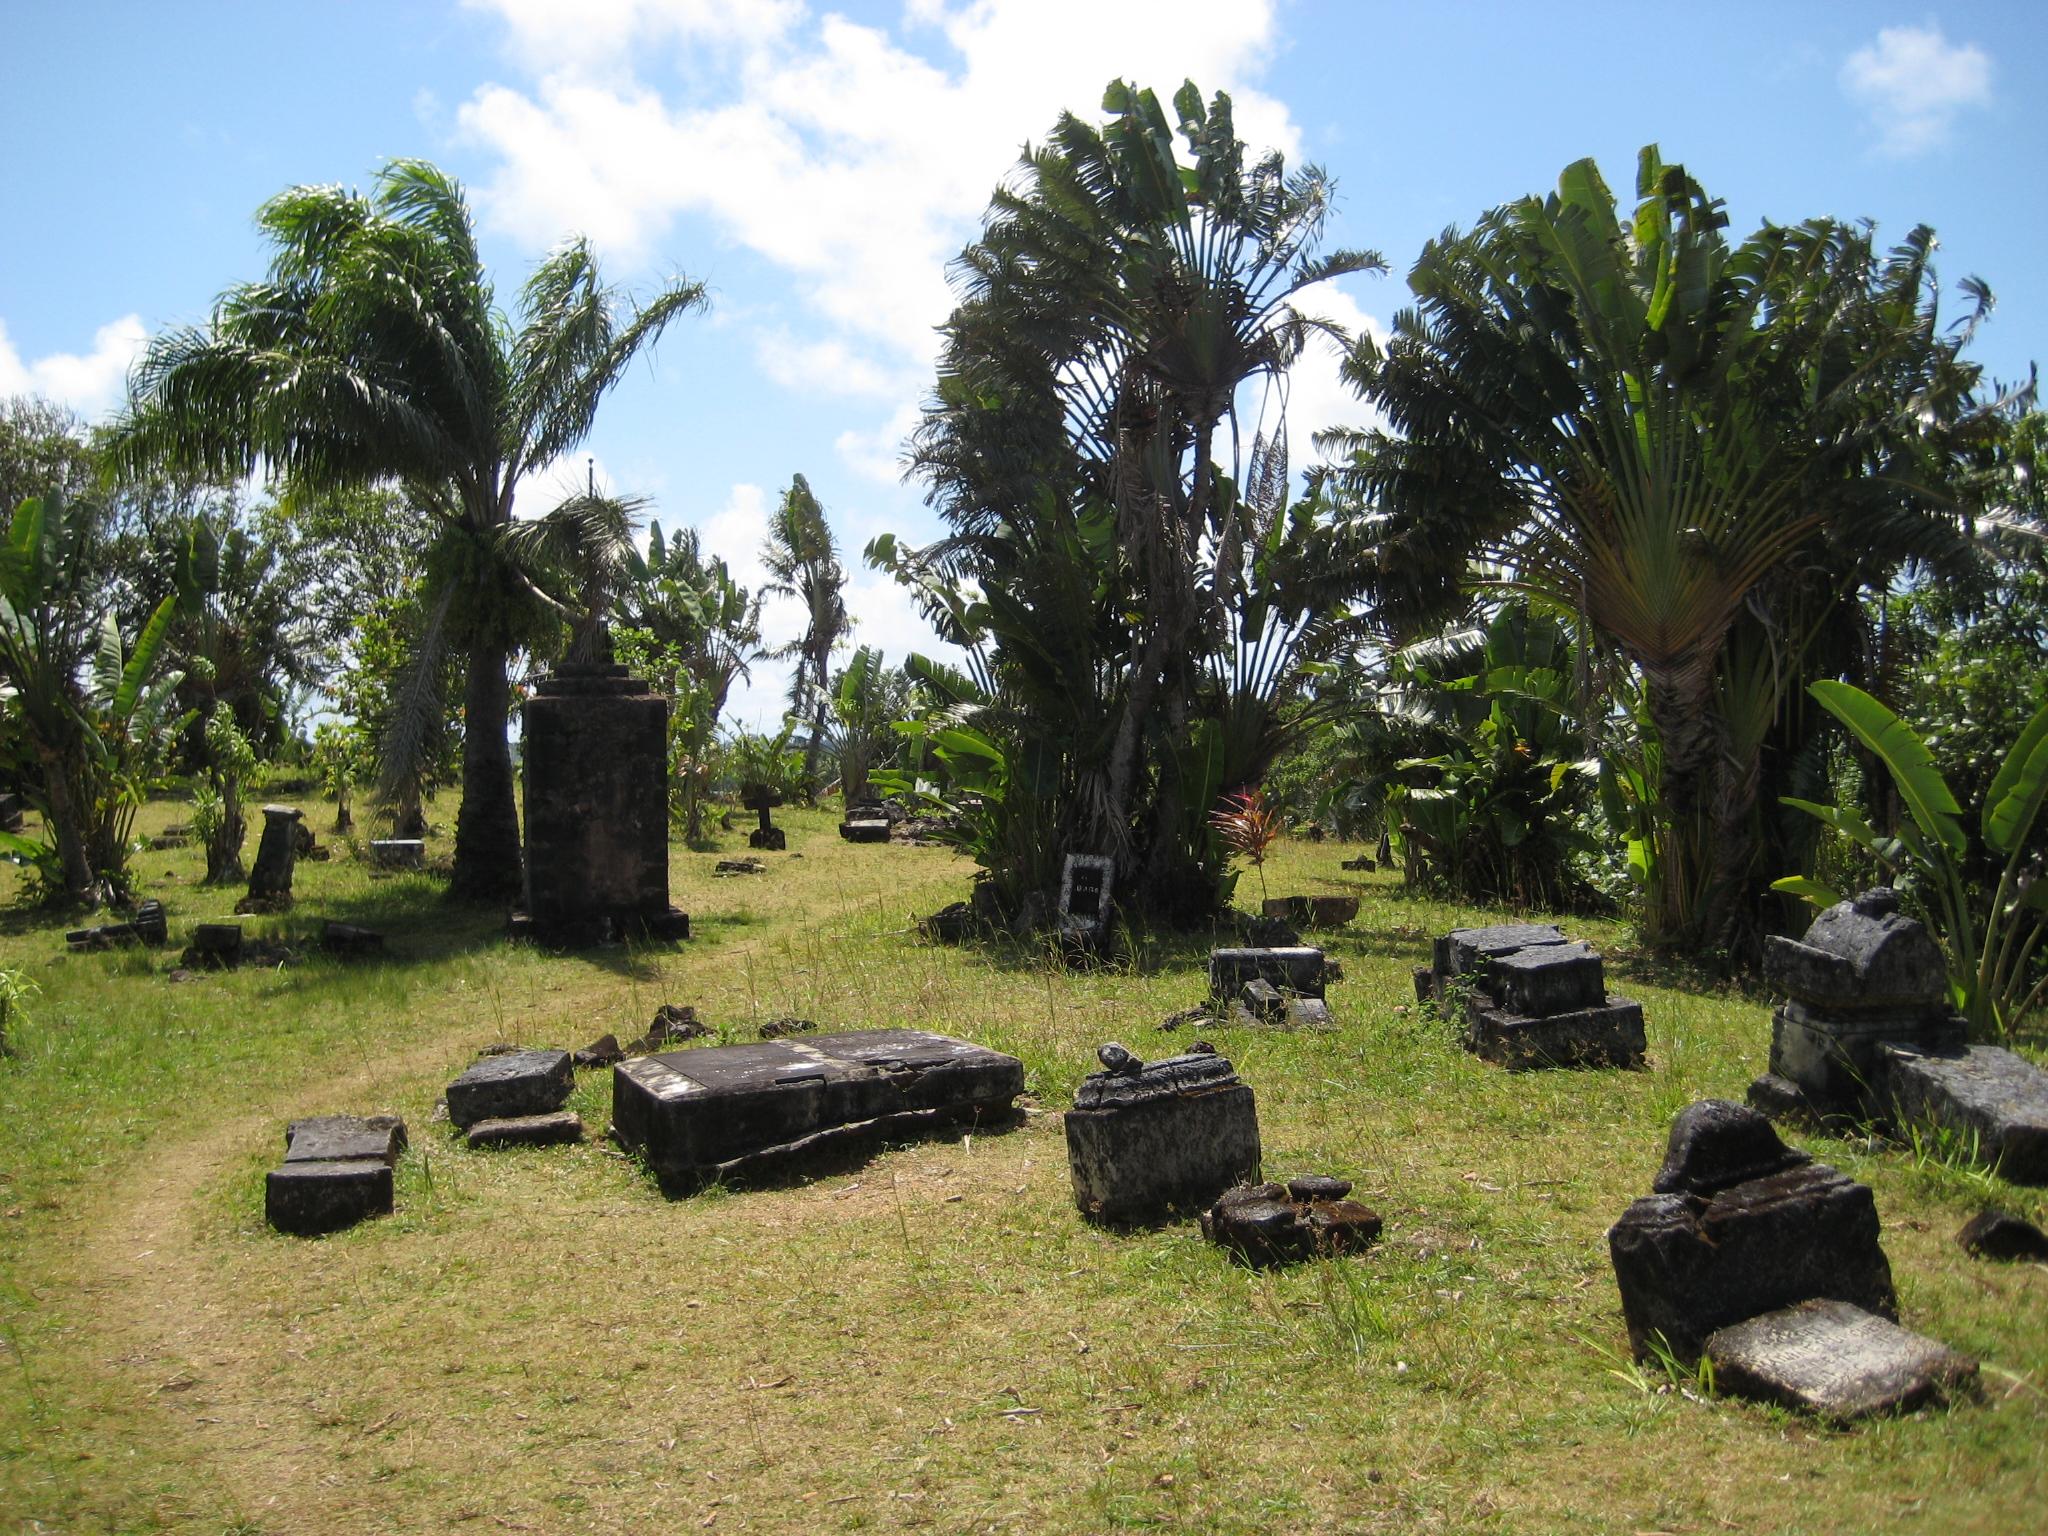 File:Pirate Cemetery, Ile Sainte-Marie.jpg